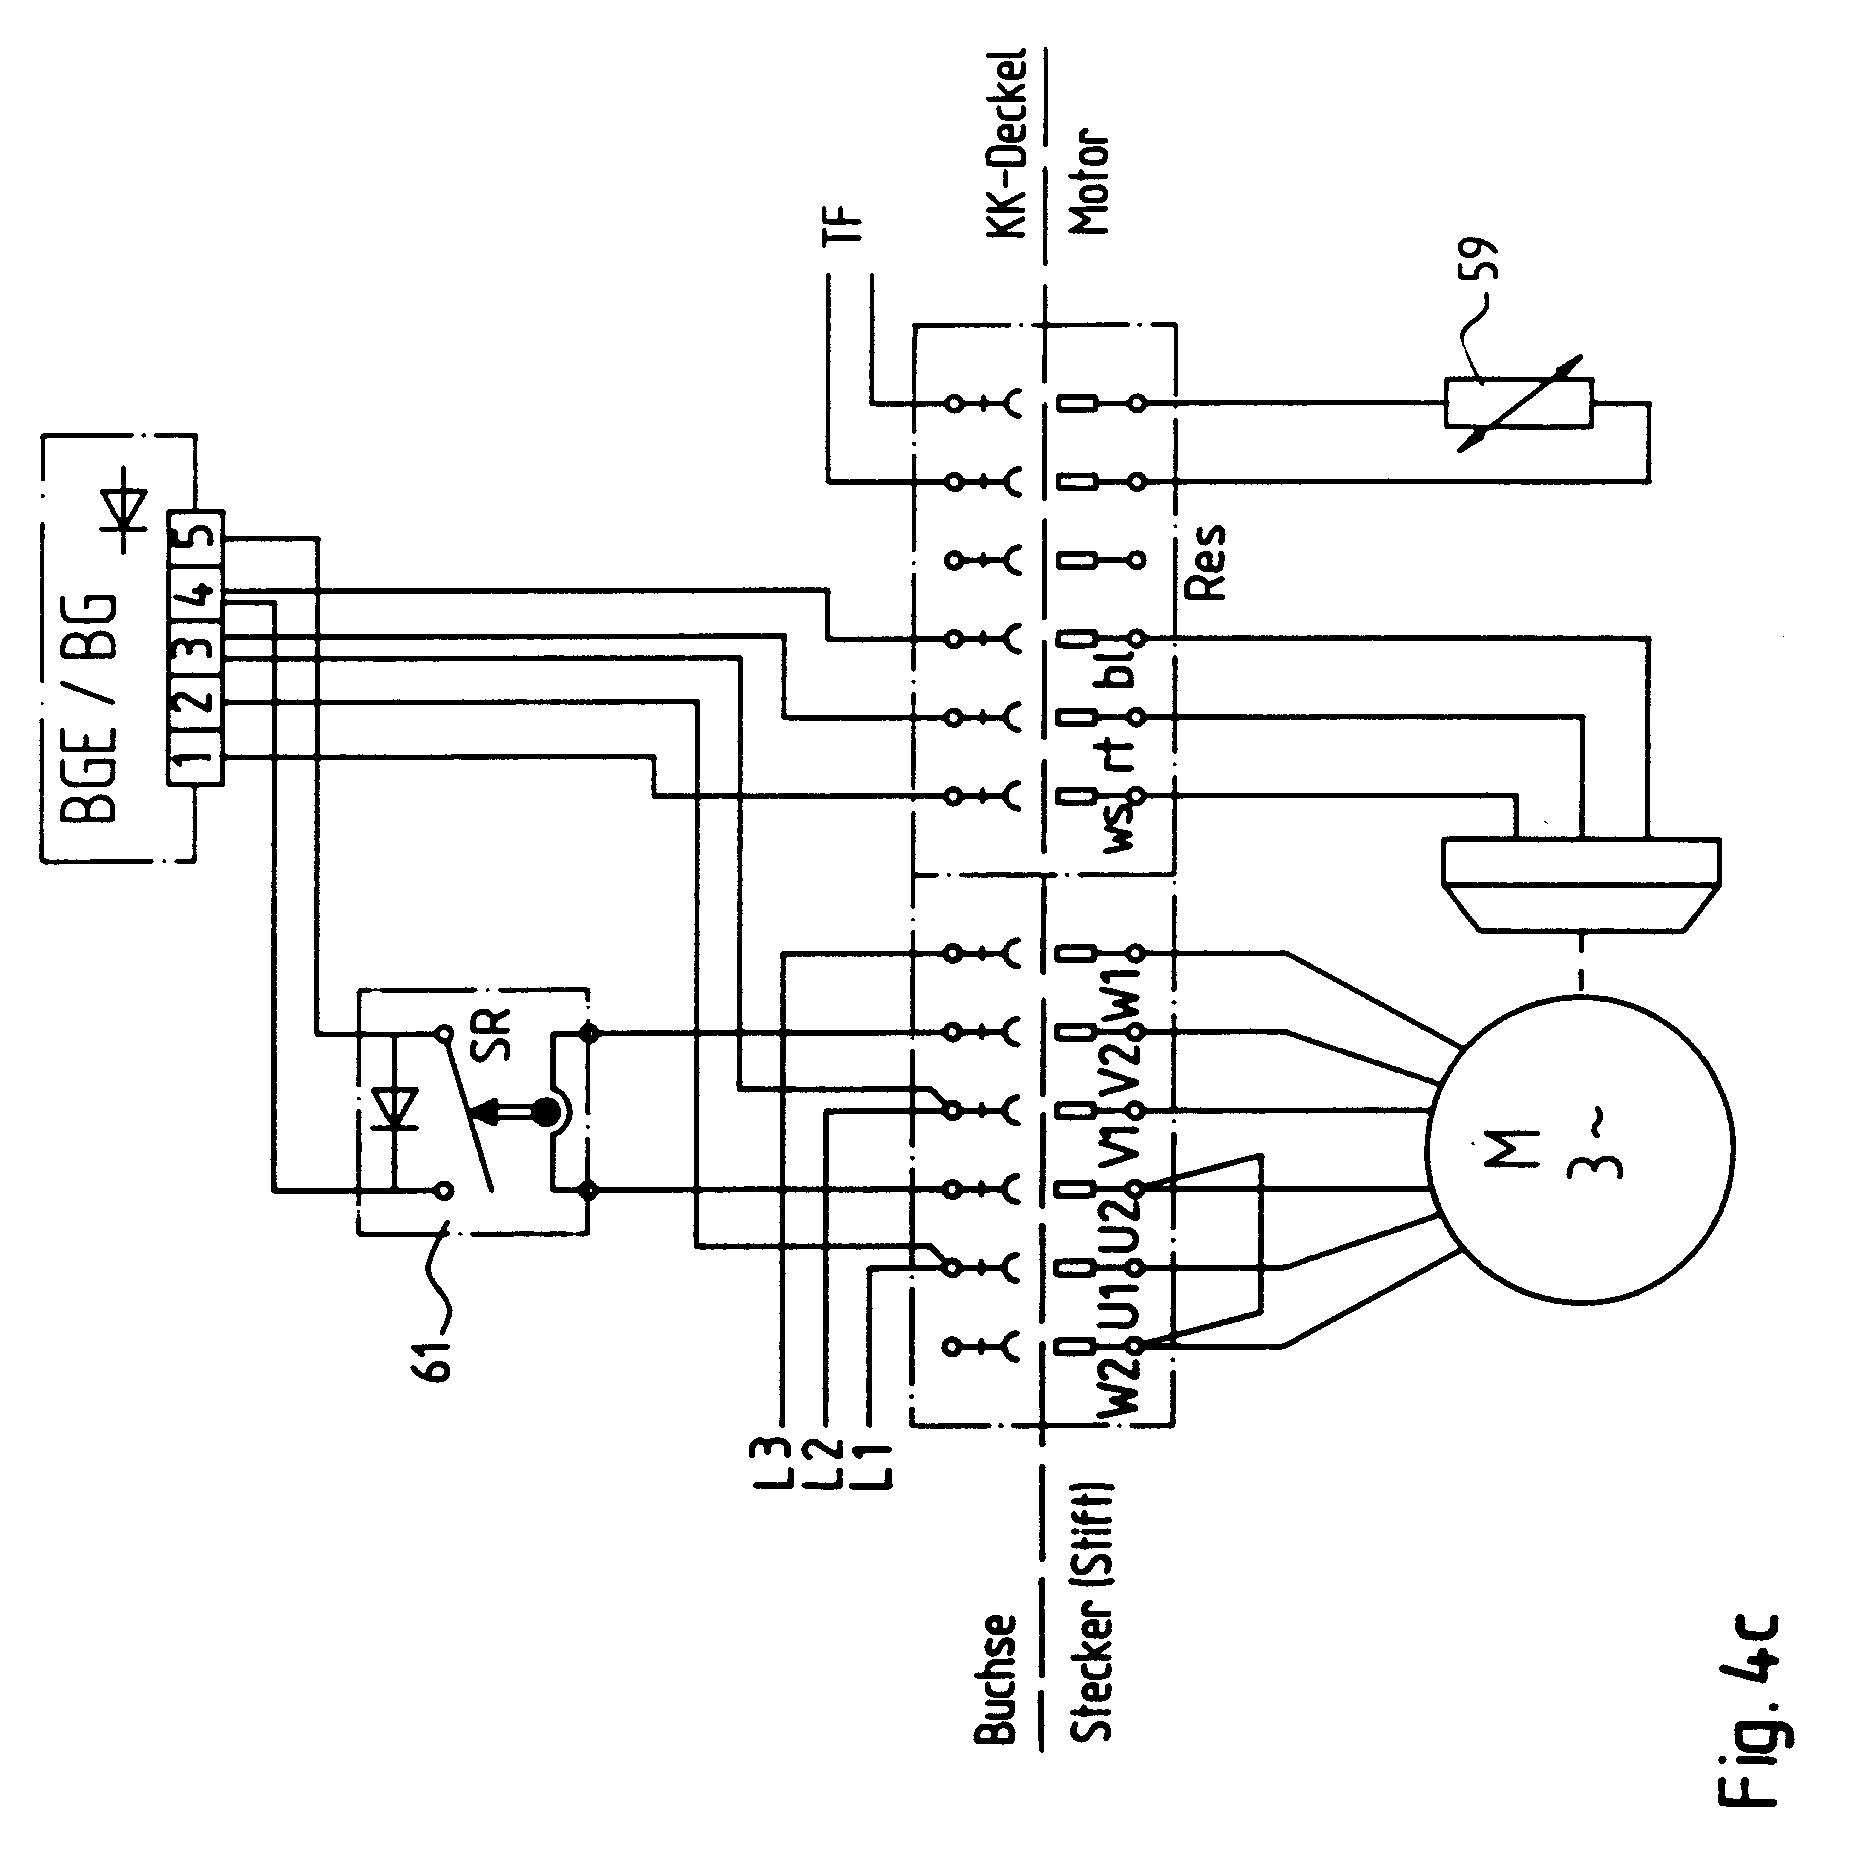 Encoder Wiring Diagram Image collections - Diagram Design Ideas